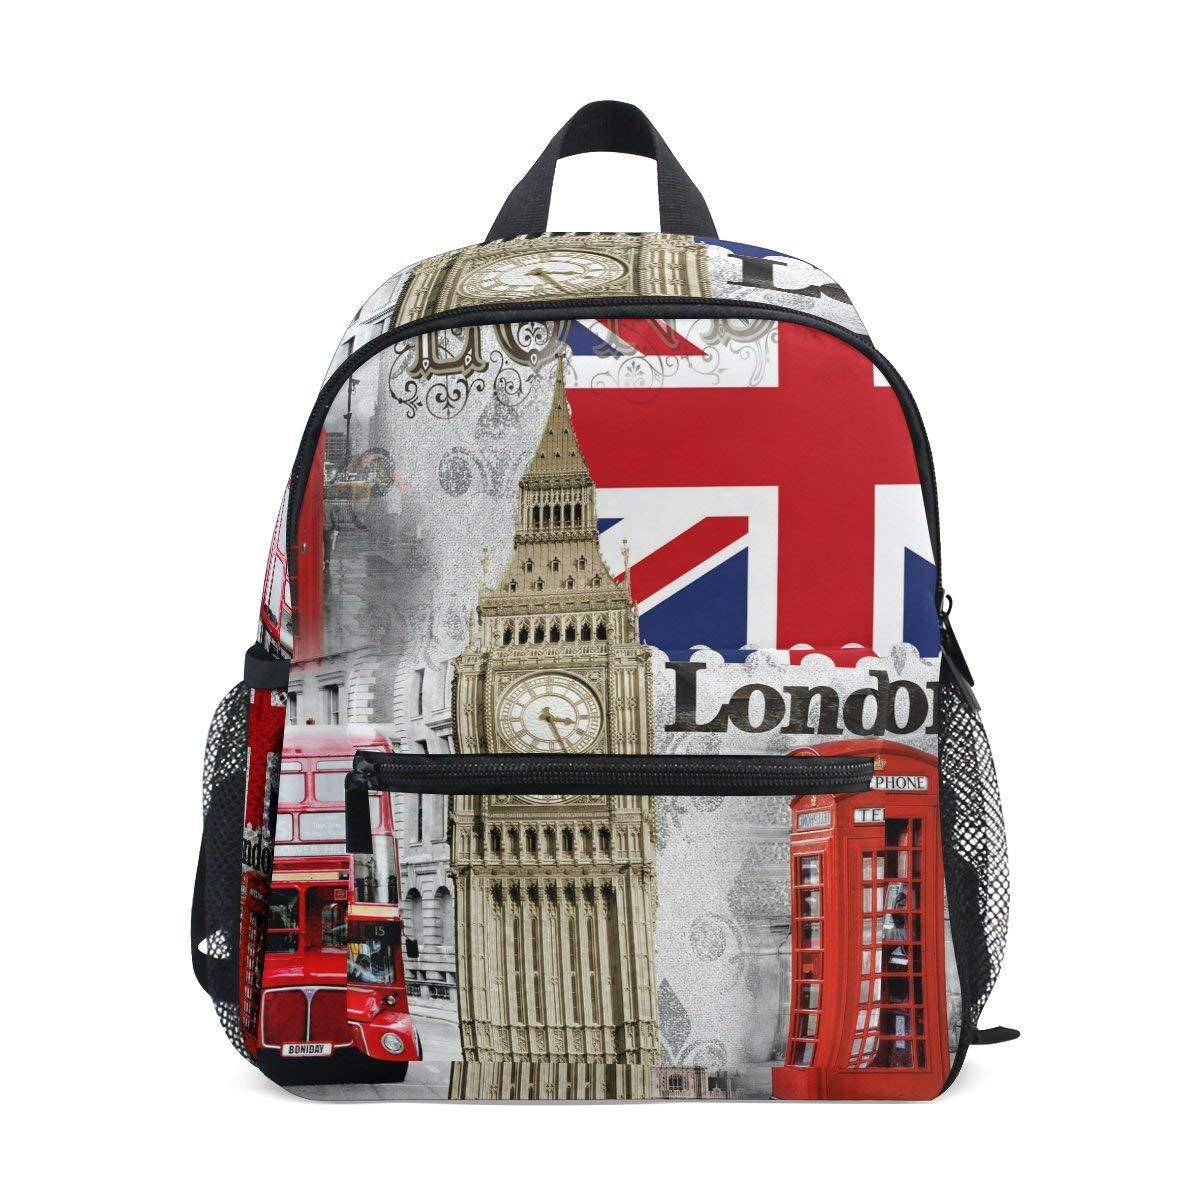 c3cda1dbaea Get Quotations · ZZKKO Retro Vintage Union Jack London Bigben Kids Backpack  Pre-School Bag for Kindergarten Toddler